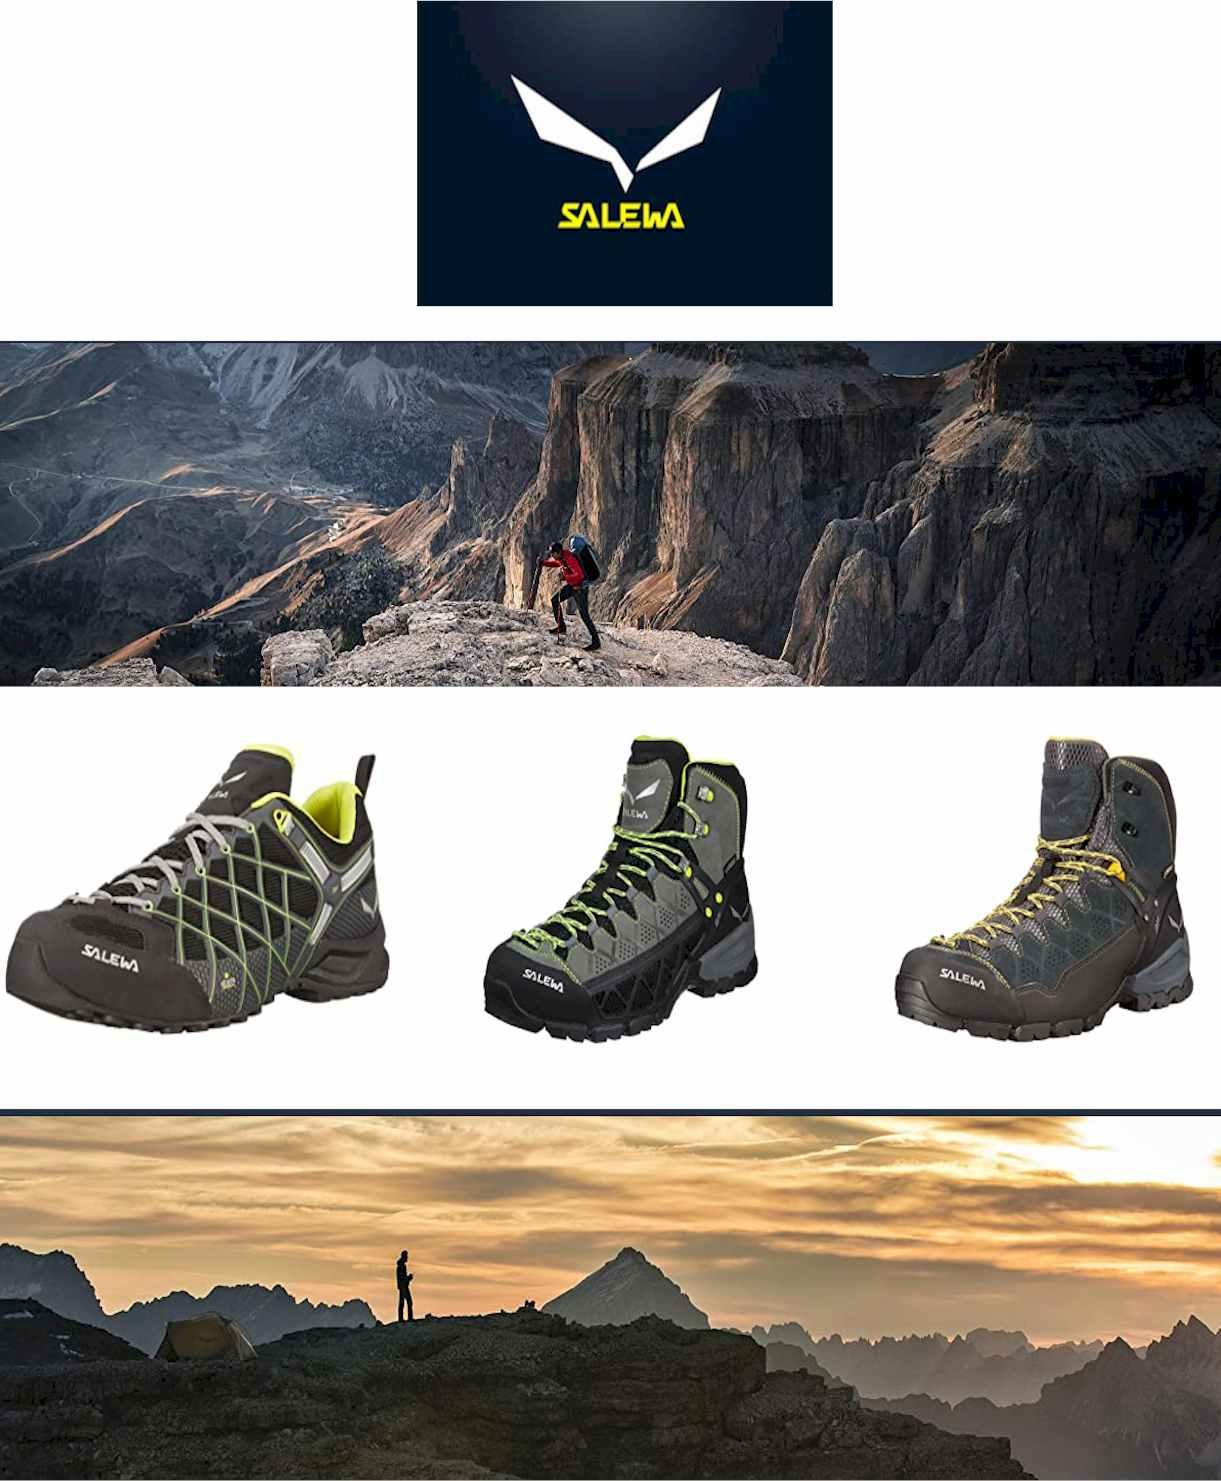 #Salewa  sport wear - #hiking #Trekking #casual #Outdoor #camping #Woman